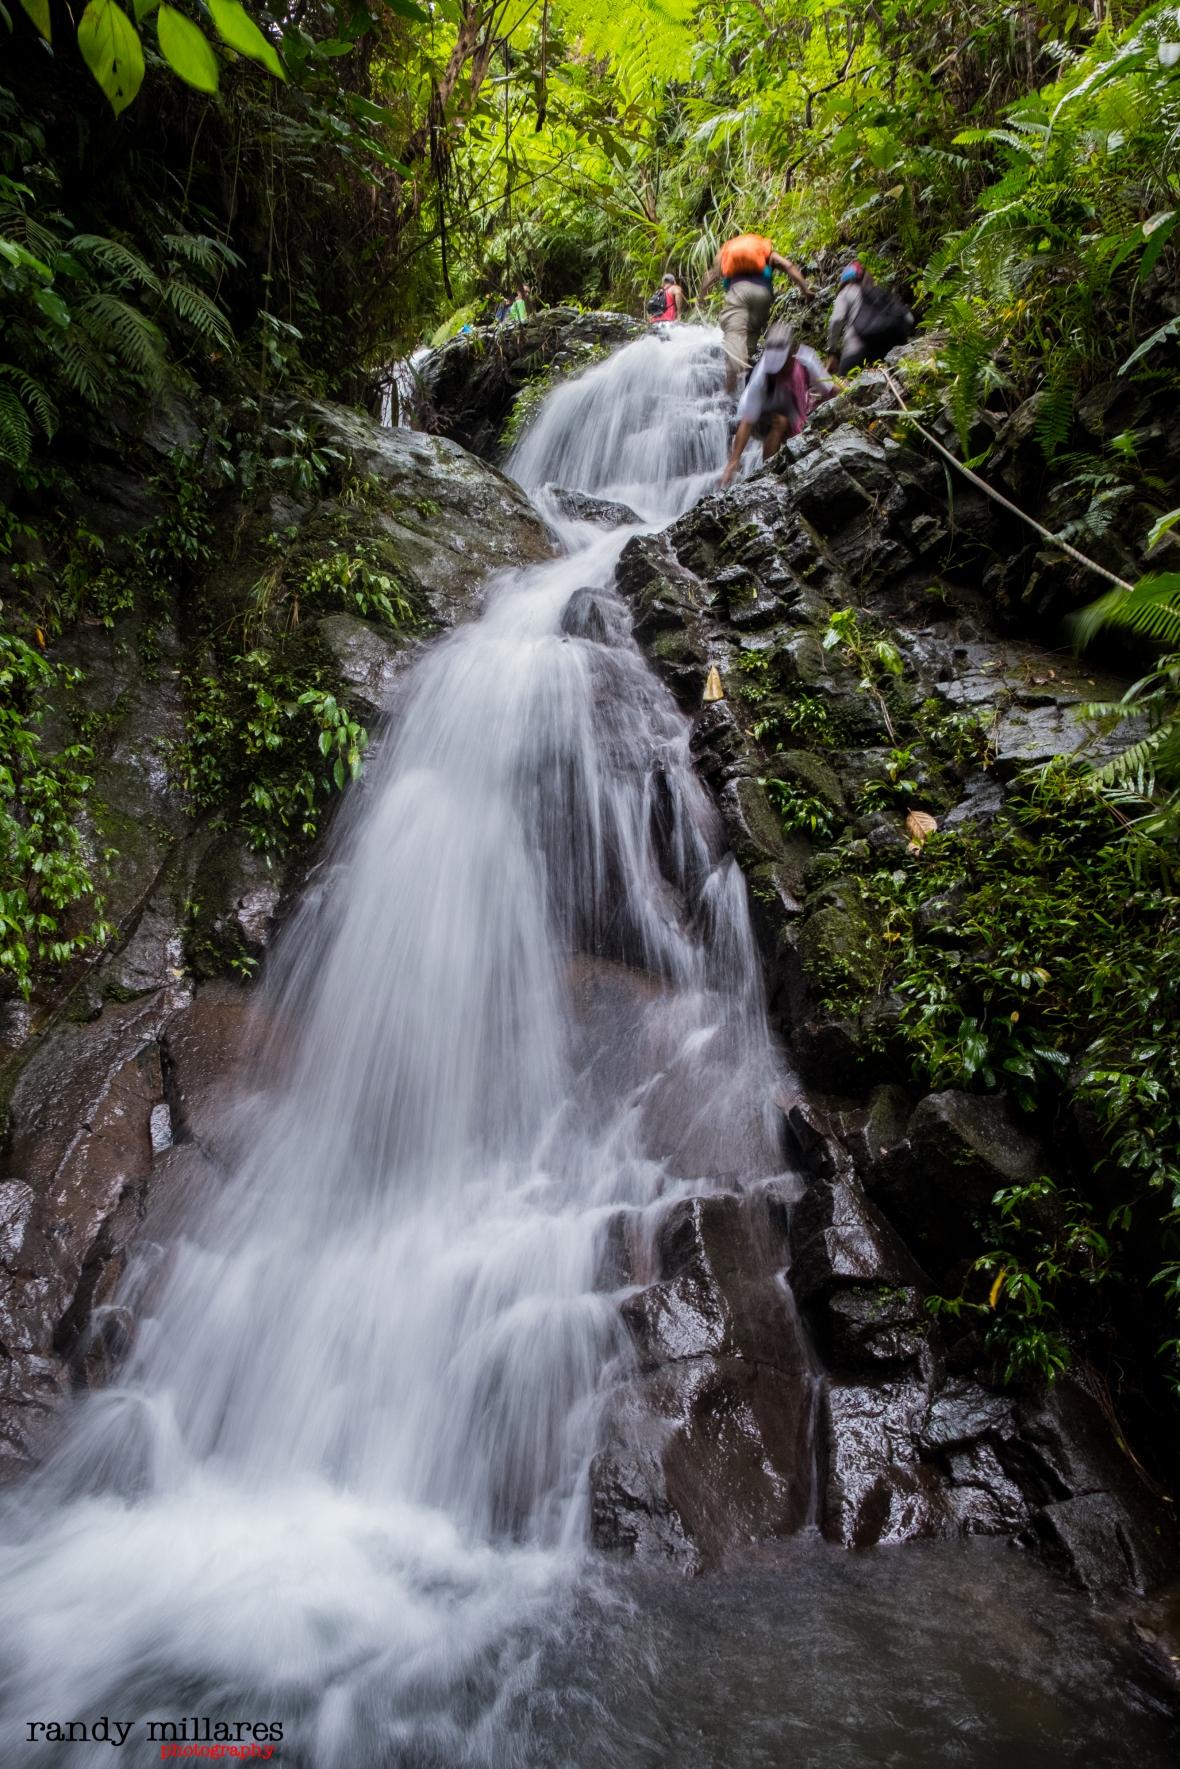 paphaan falls small